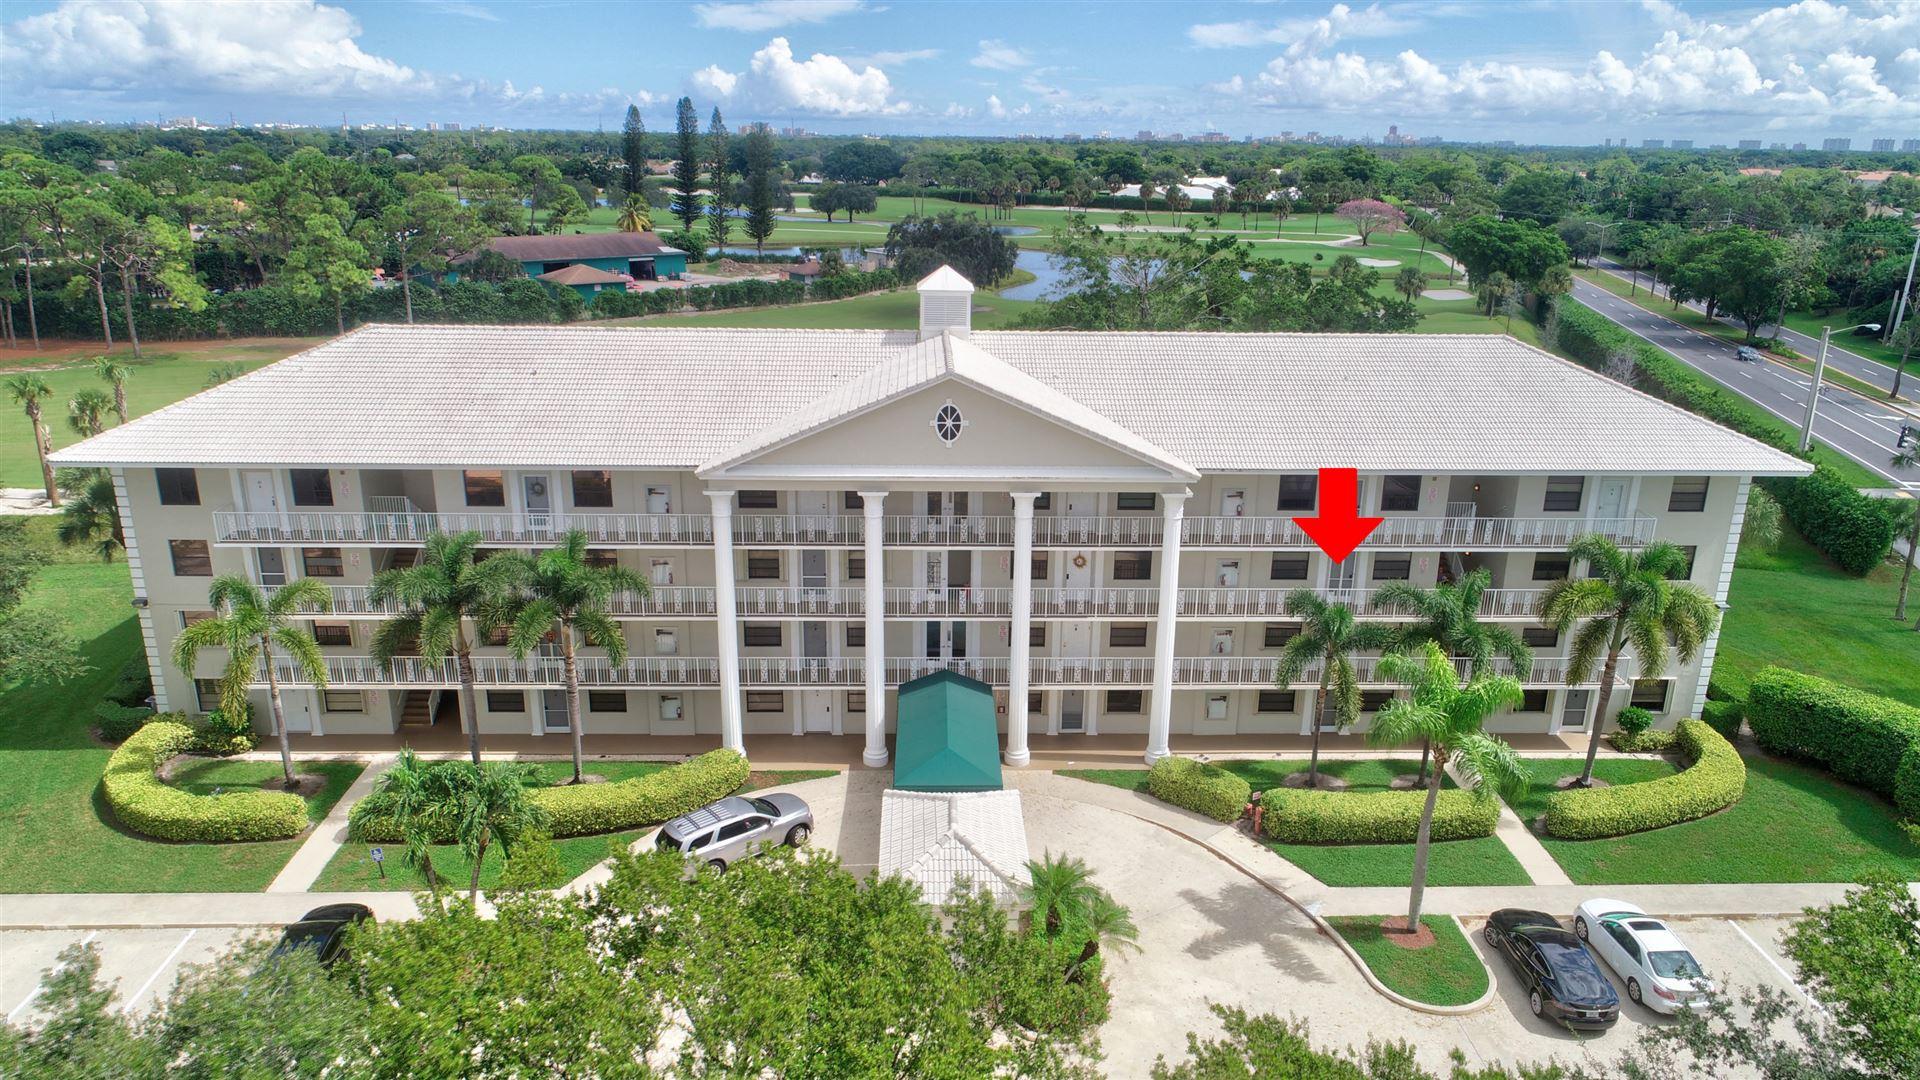 6061 Balboa Circle #305, Boca Raton, FL 33433 - #: RX-10568987